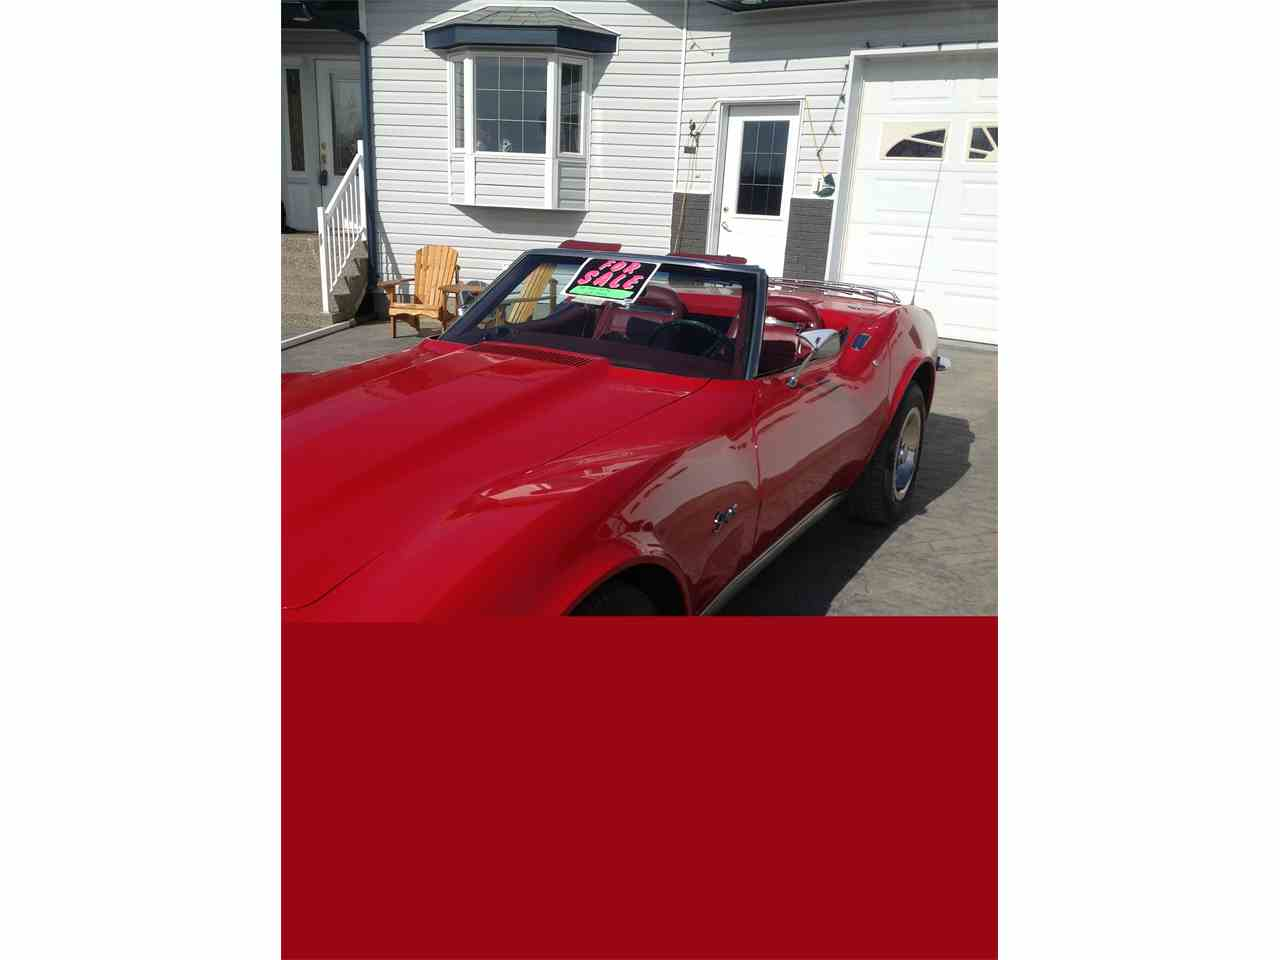 Large Picture of 1973 Chev Corvette located in Grande Prairie Alberta - $24,000.00 - HP0D